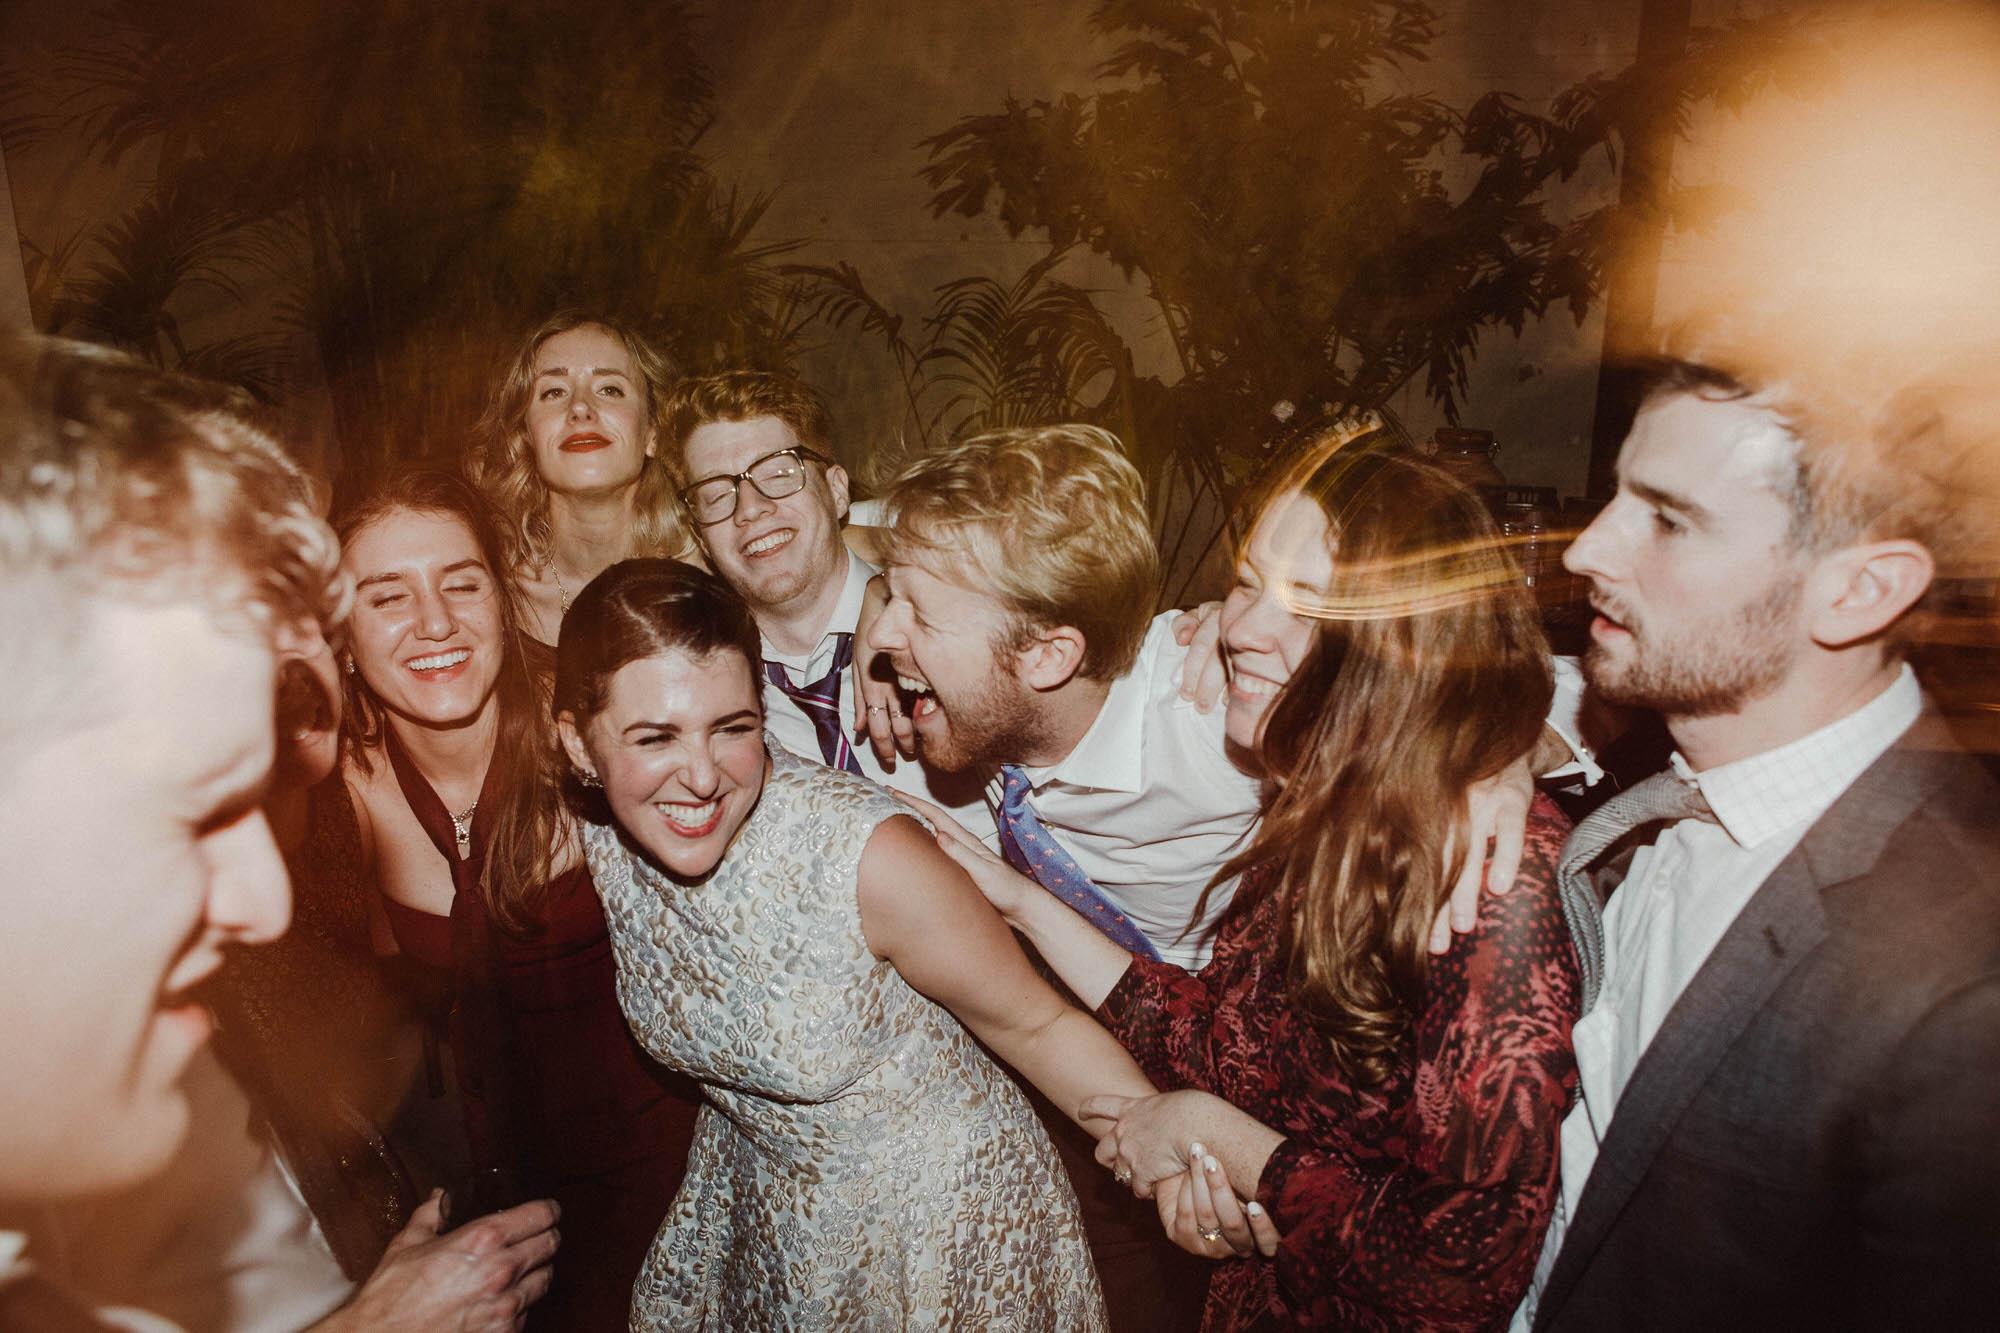 los-angeles-wedding-photographer-millwick-133.jpg